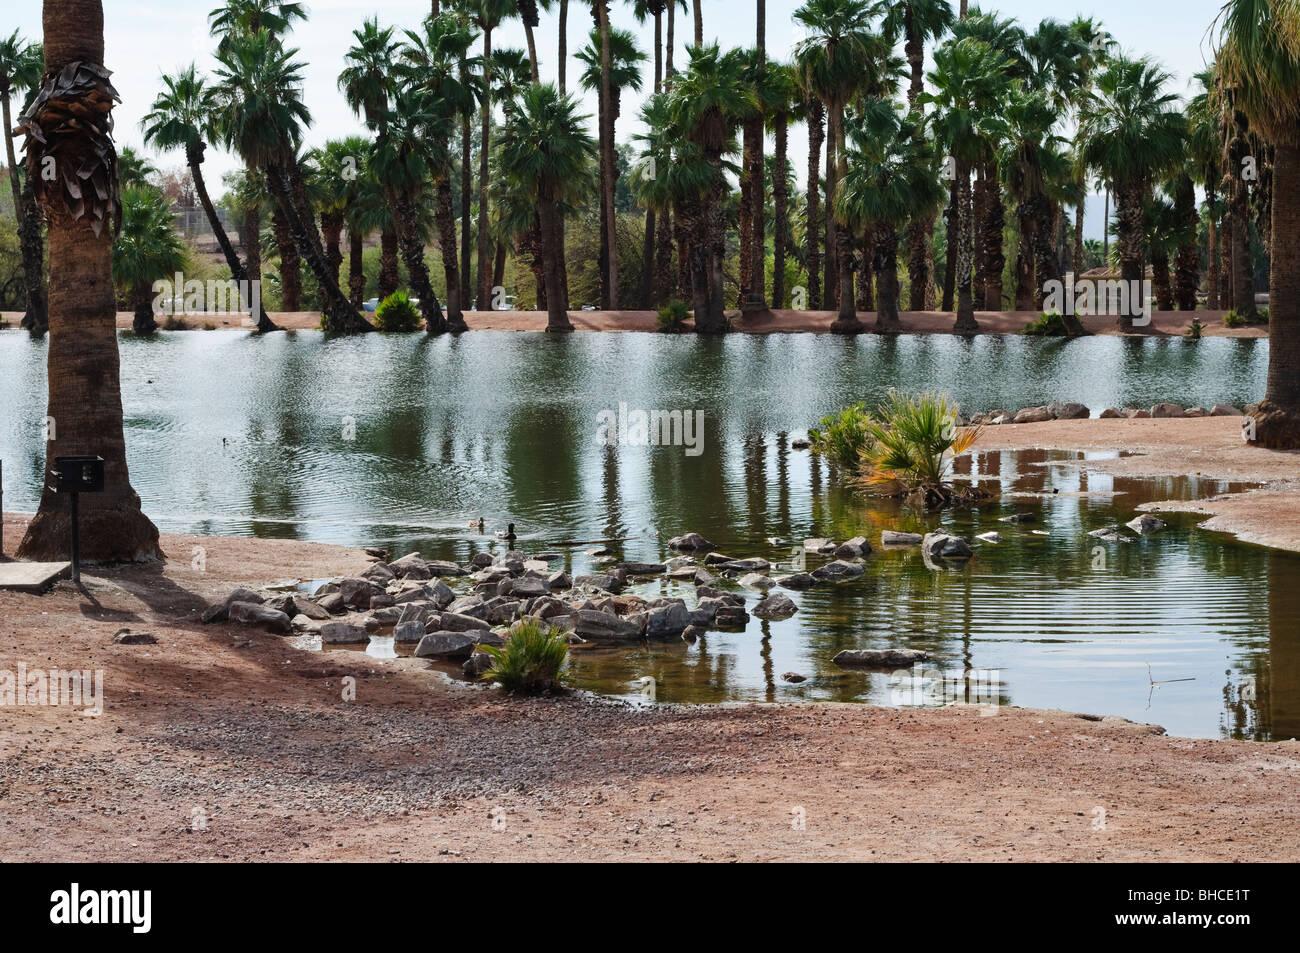 Palm Trees Surround The Ponds At Papago Park In Phoenix Arizona Stock Photo Royalty Free Image